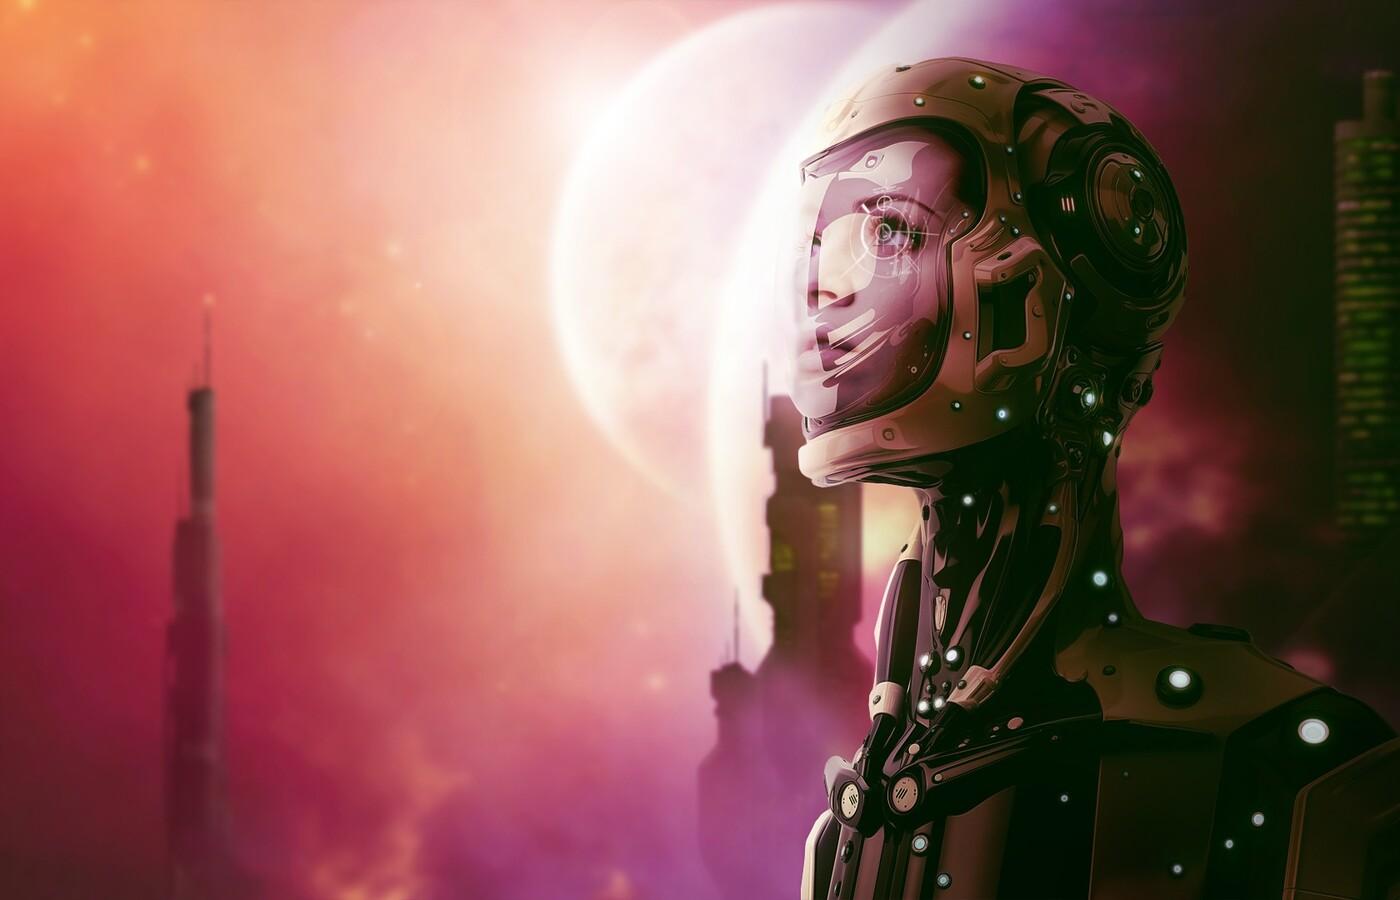 space-girl.jpg